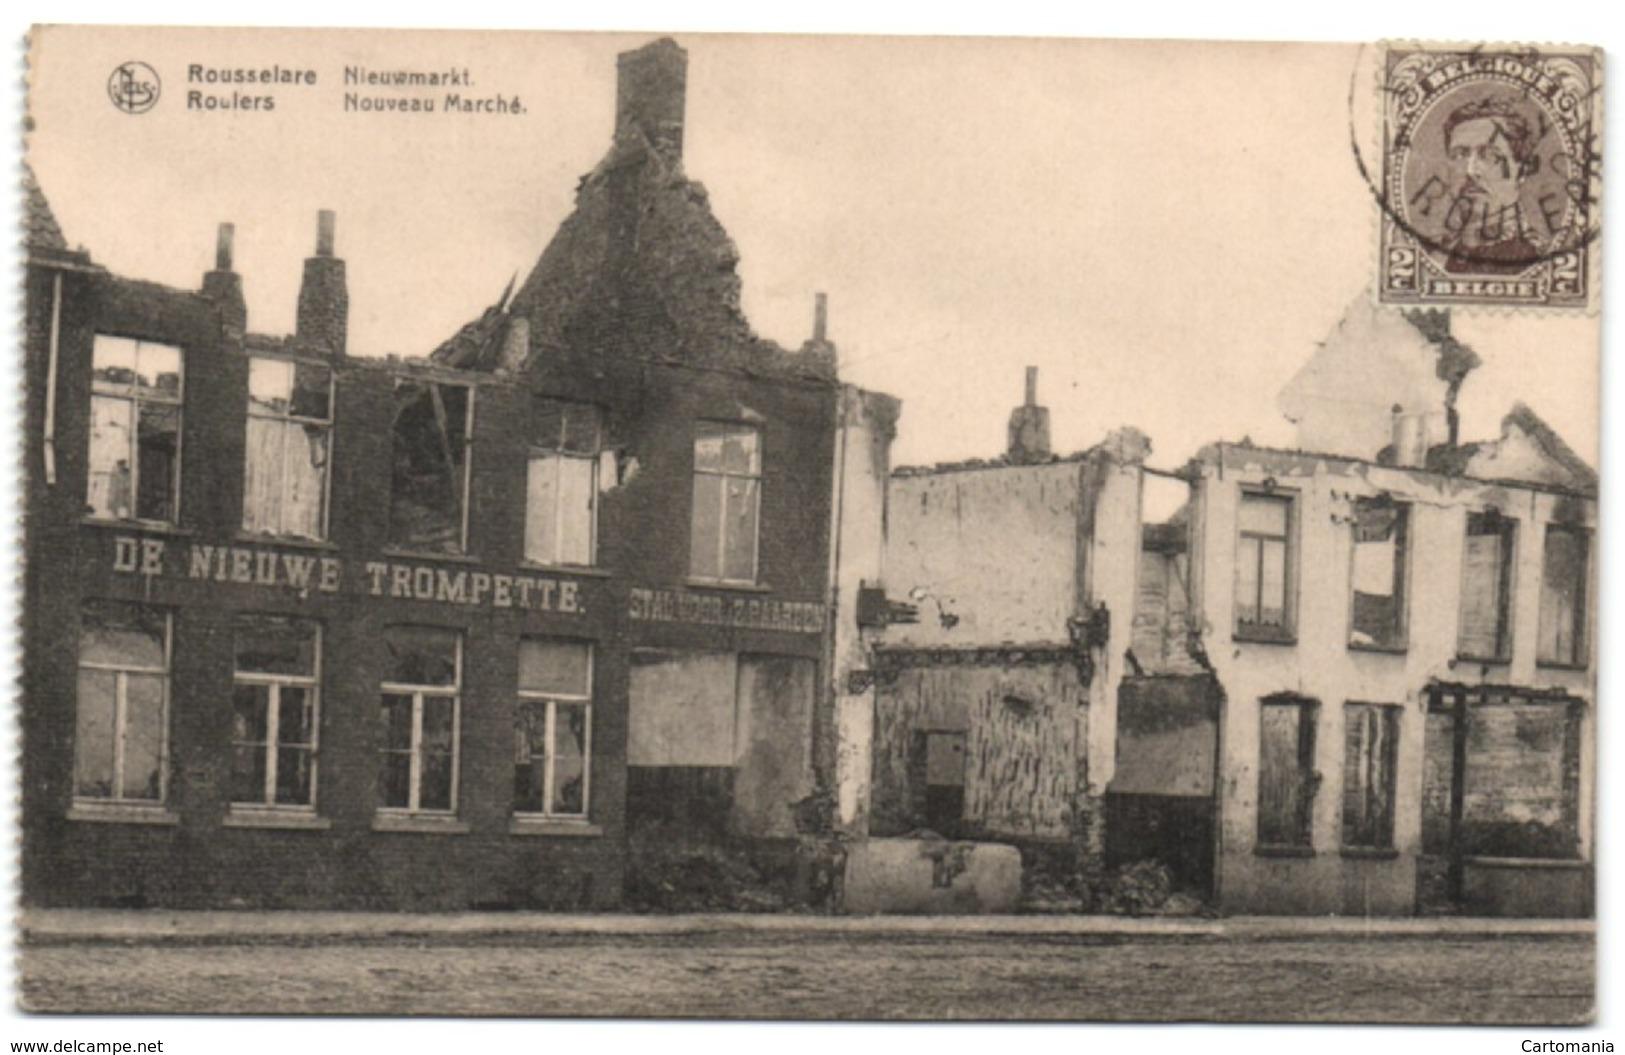 Rousselare - Nieuwmarkt - Roeselare